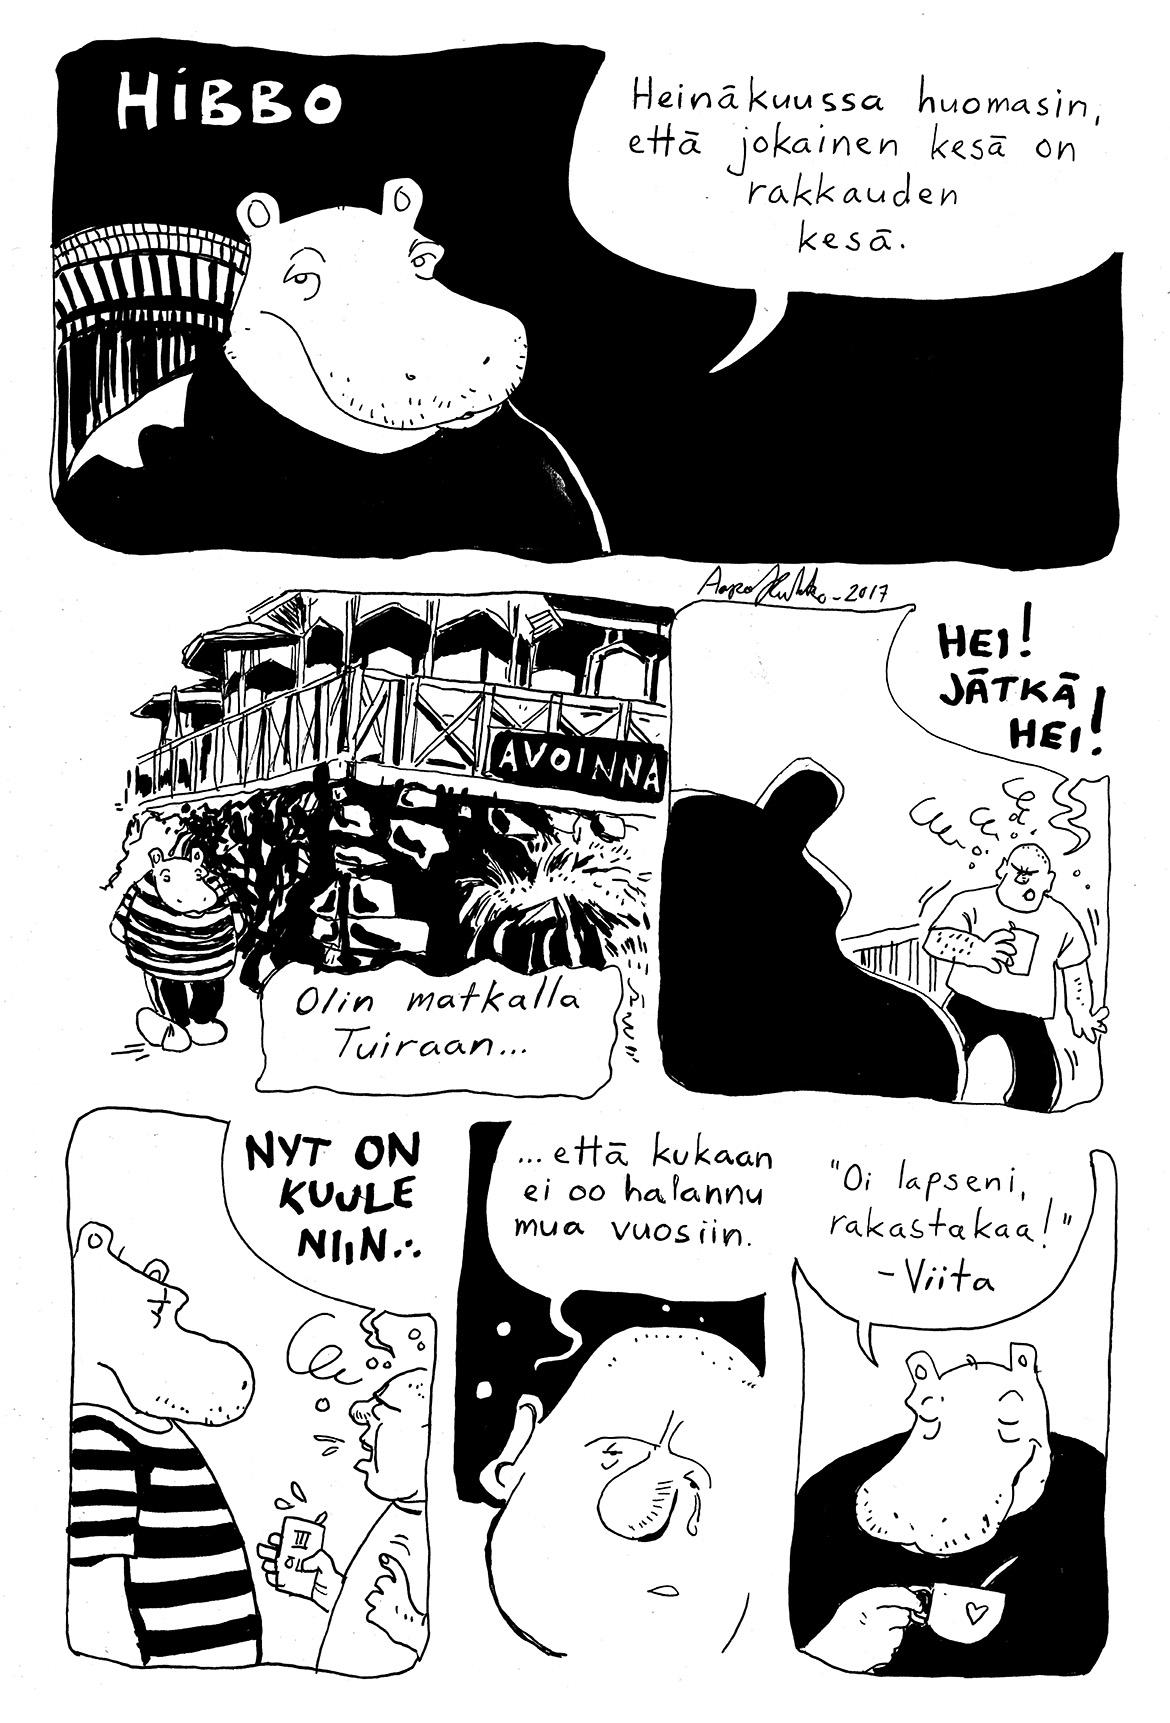 Aapo Kukko: Hibbo